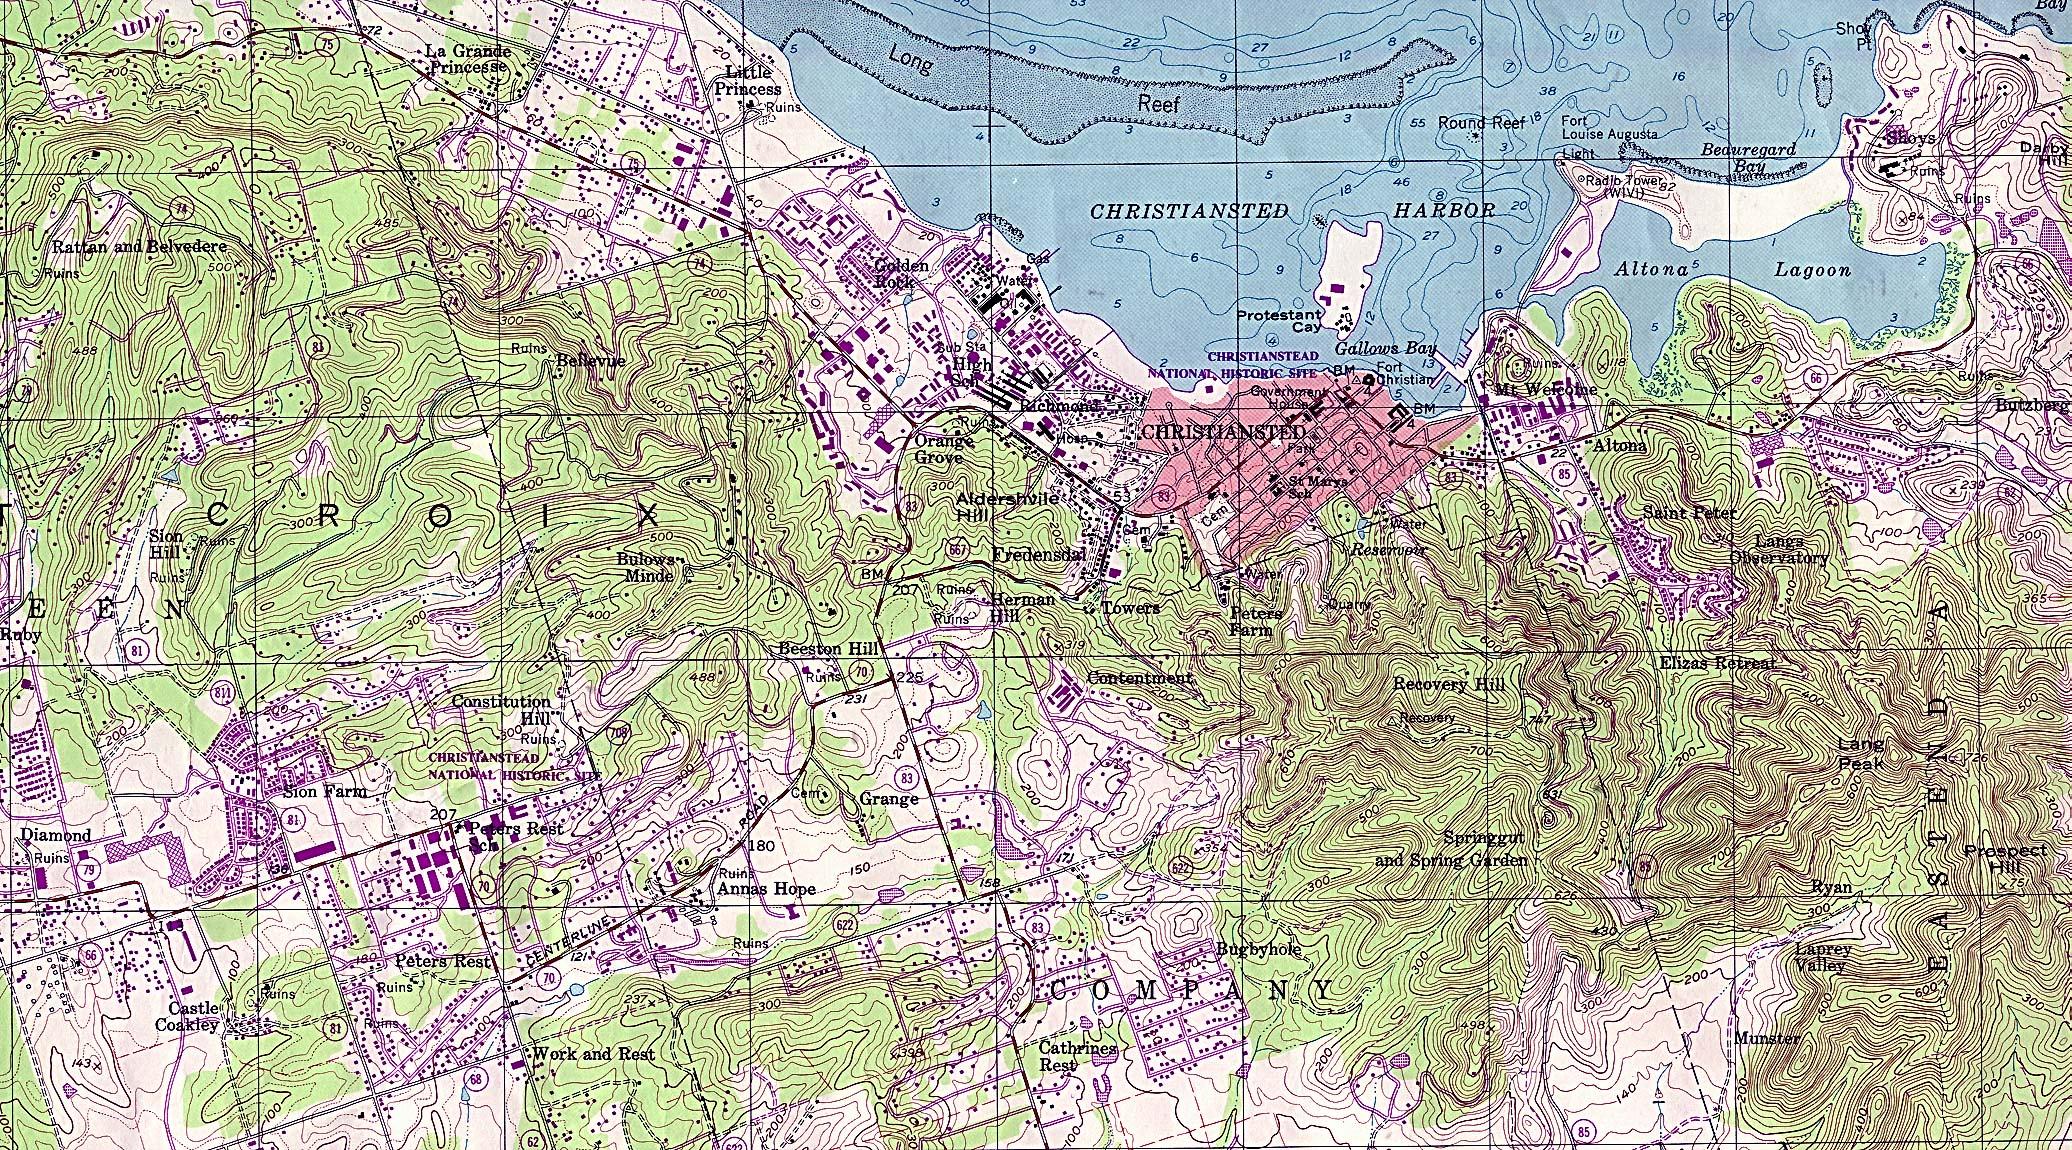 US Virgin Islands Maps PerryCastañeda Map Collection UT - Virgin islands map us